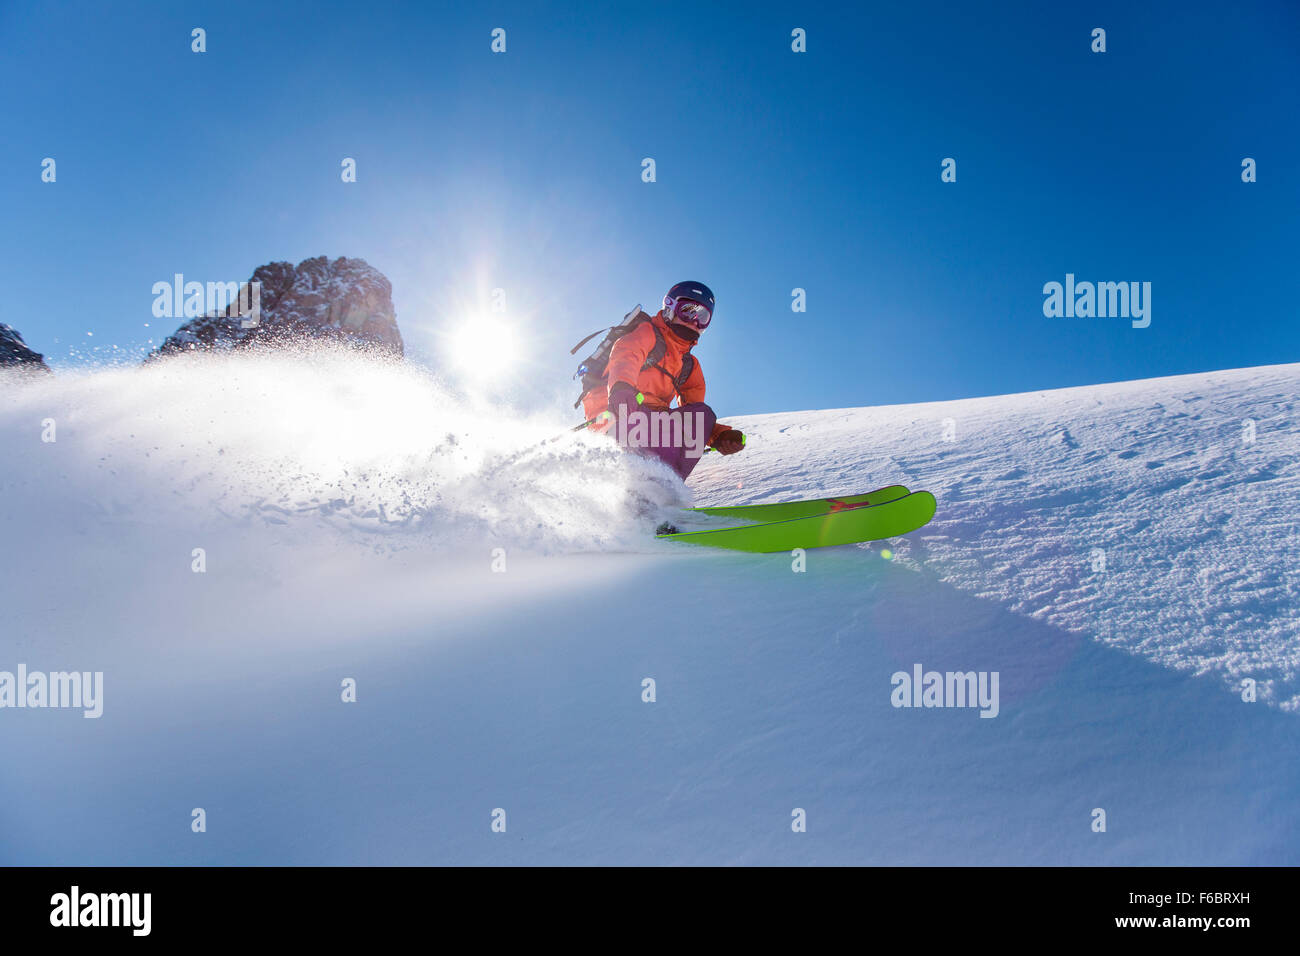 Freerider off-piste in deep snow, Muttereralmpark, Nockspitze (2403m) behind, North Tyrol, Austria - Stock Image